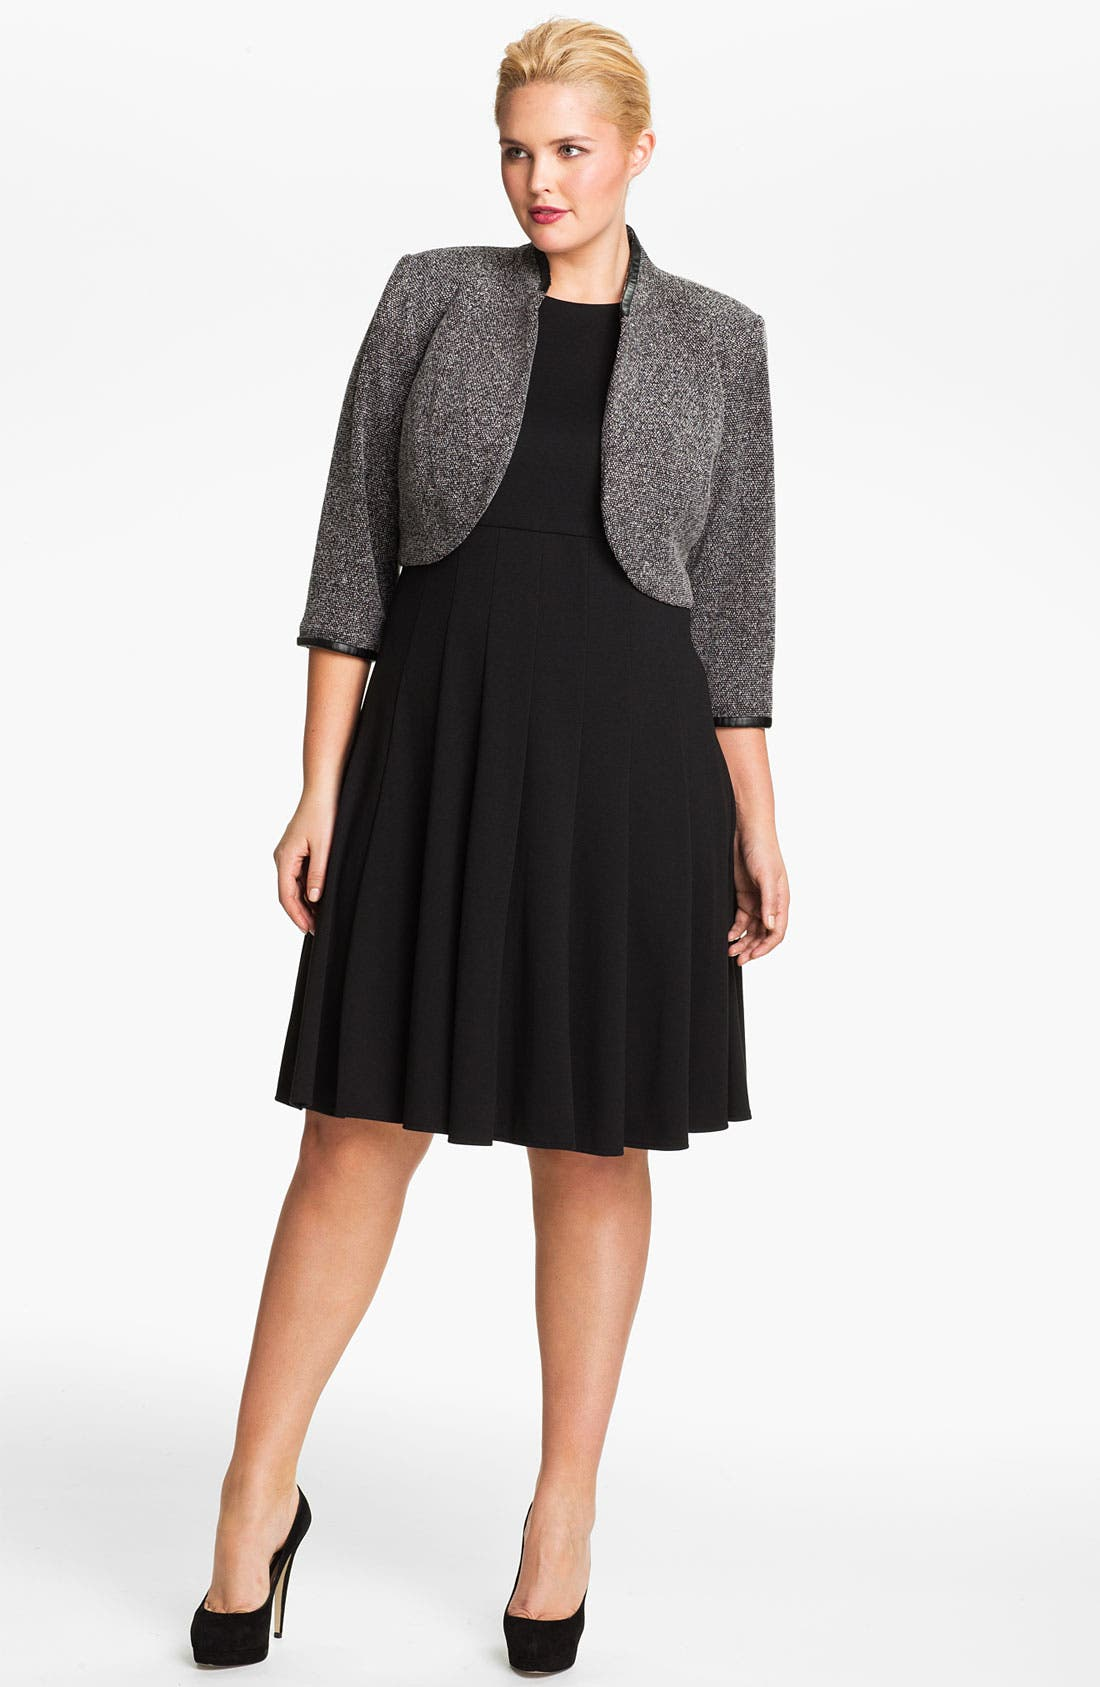 Alternate Image 1 Selected - Eliza J Pleated Dress & Bolero Jacket (Plus)